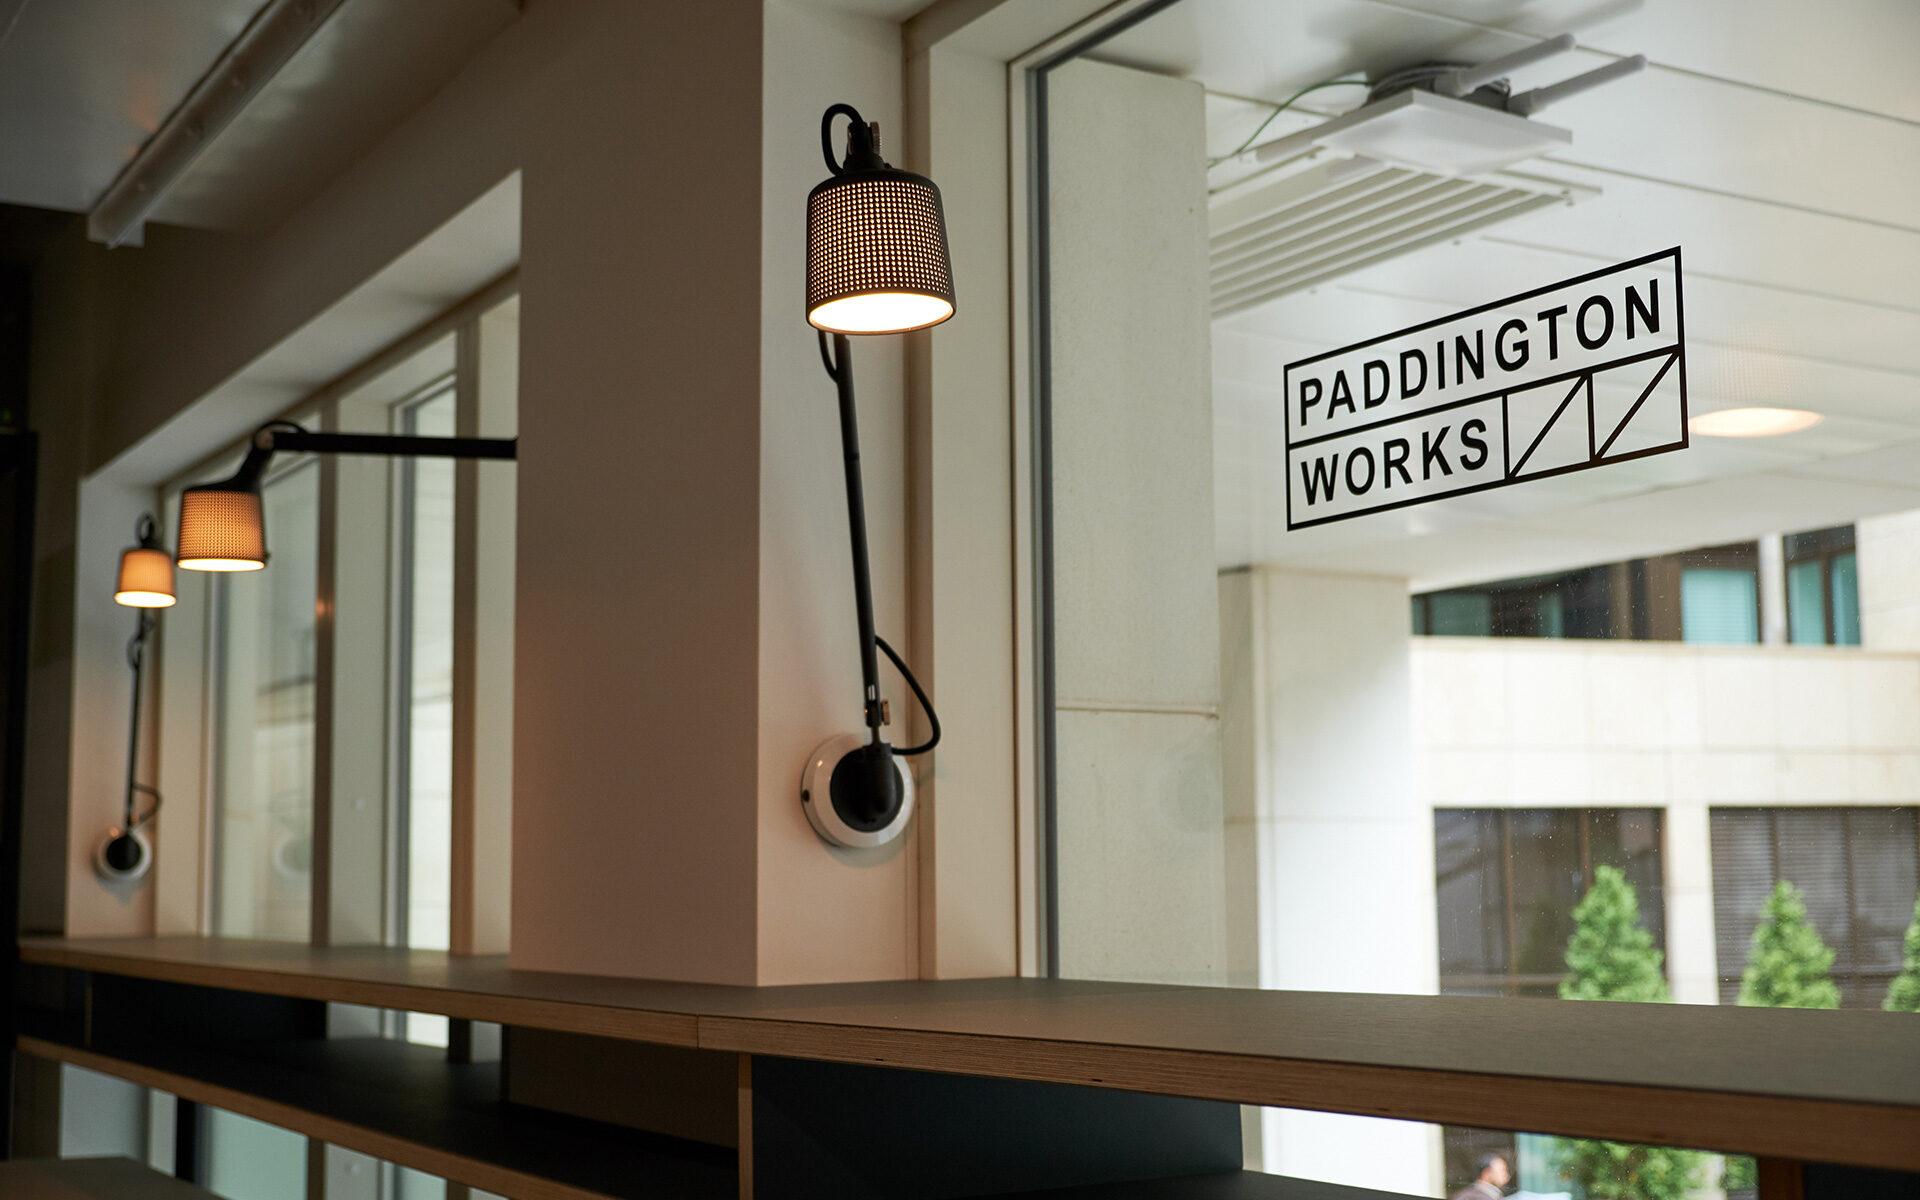 Extraordinary_05_Paddington_Works